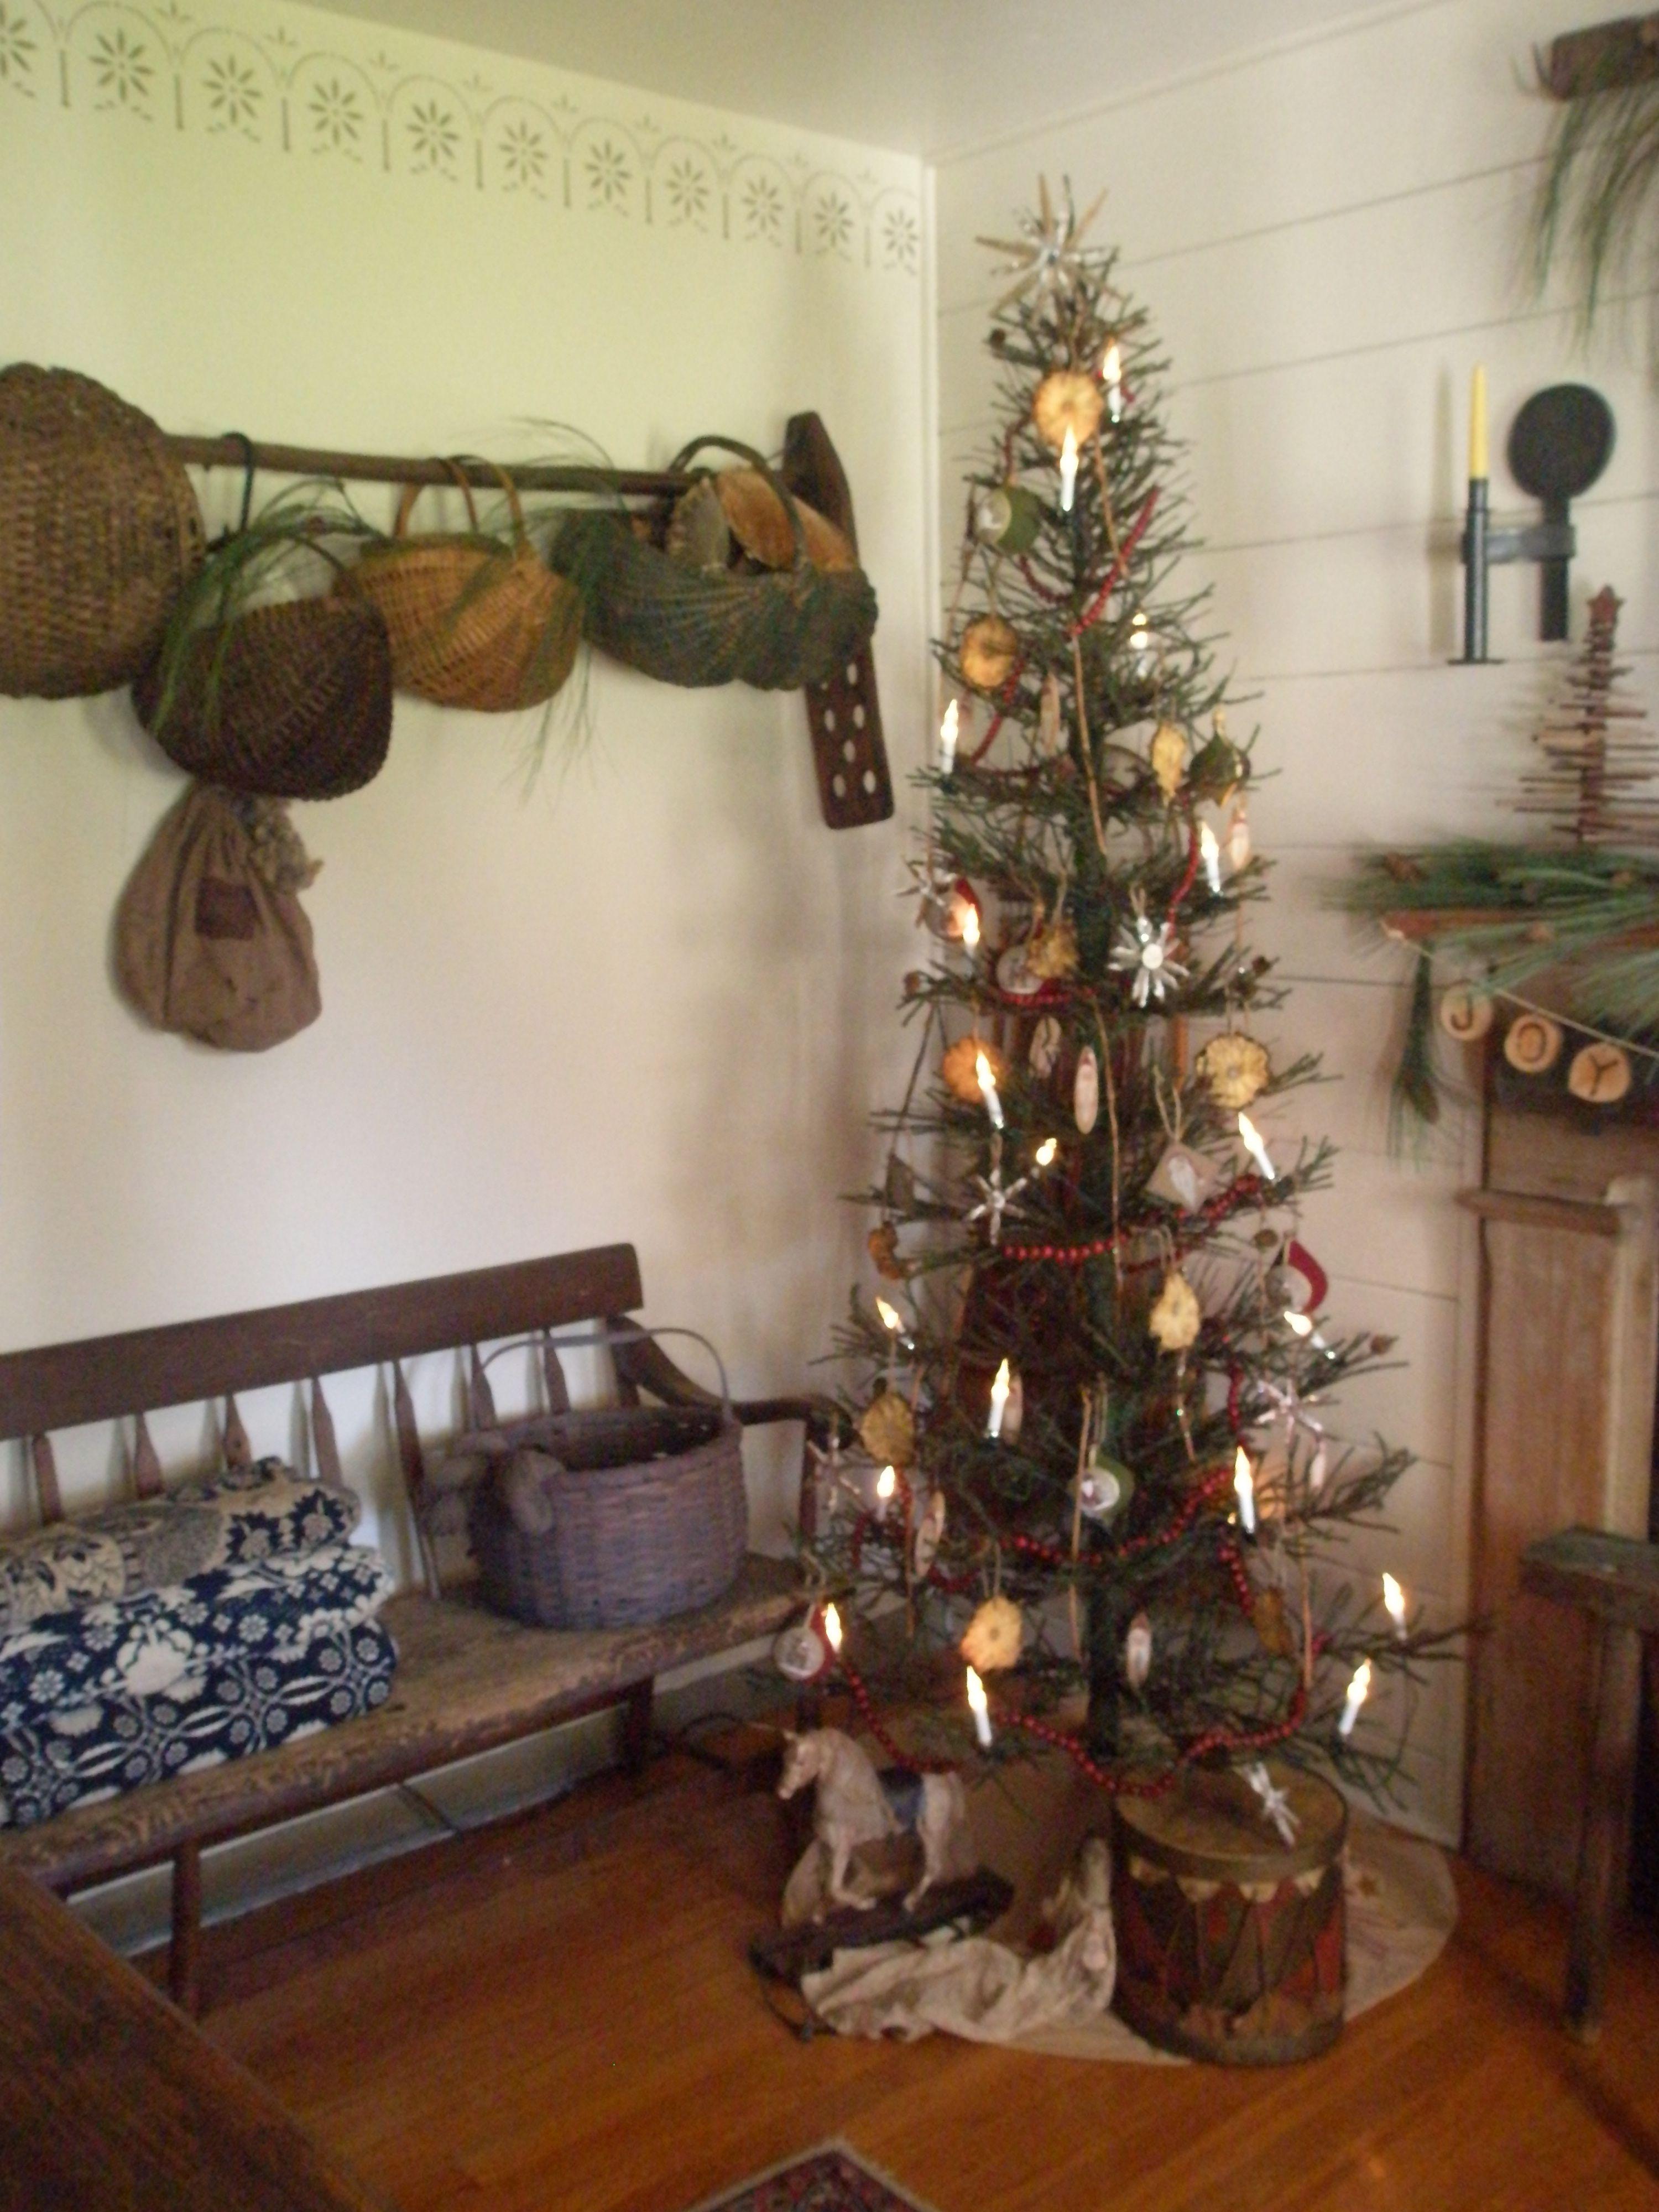 Christmas Decor Primitive Christmas Decorating Primitive Christmas Tree Country Christmas Decorations